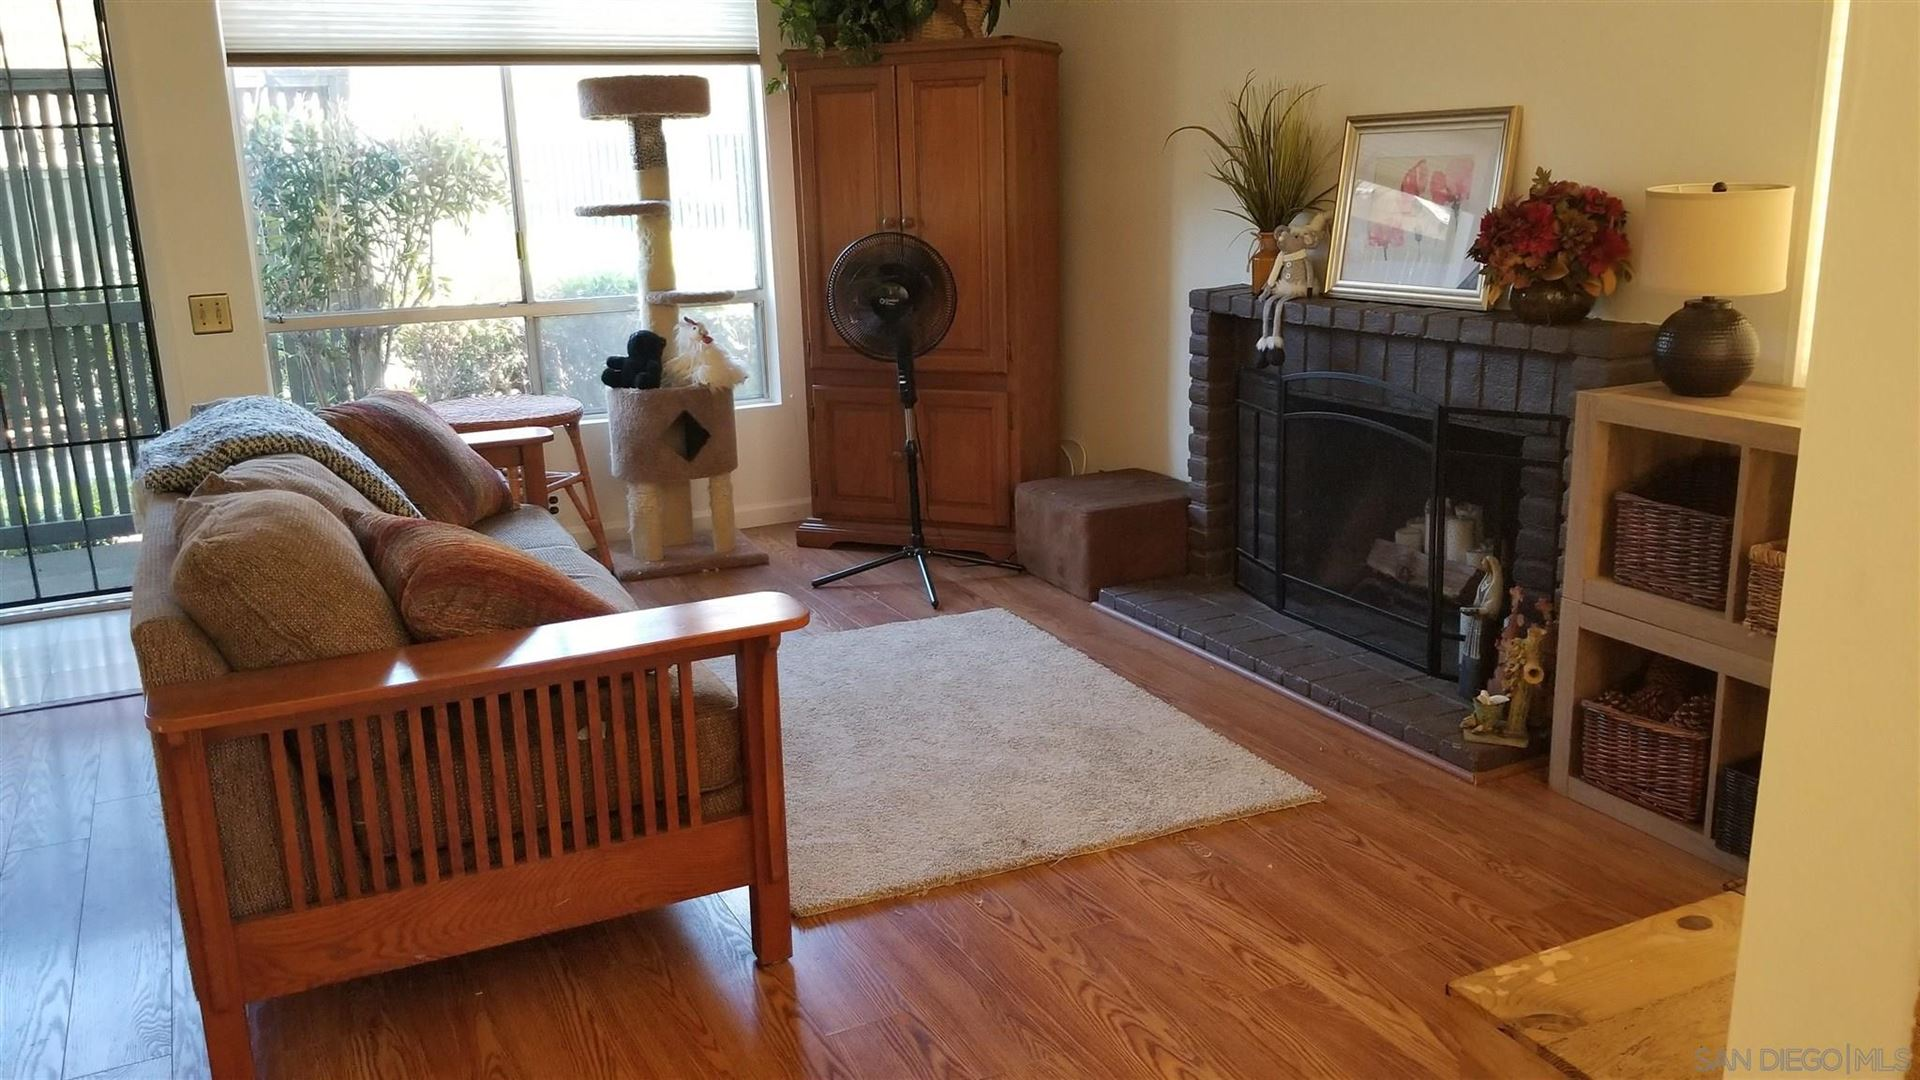 Photo of 10569 Westonhill Dr, San Diego, CA 92126 (MLS # 210016394)